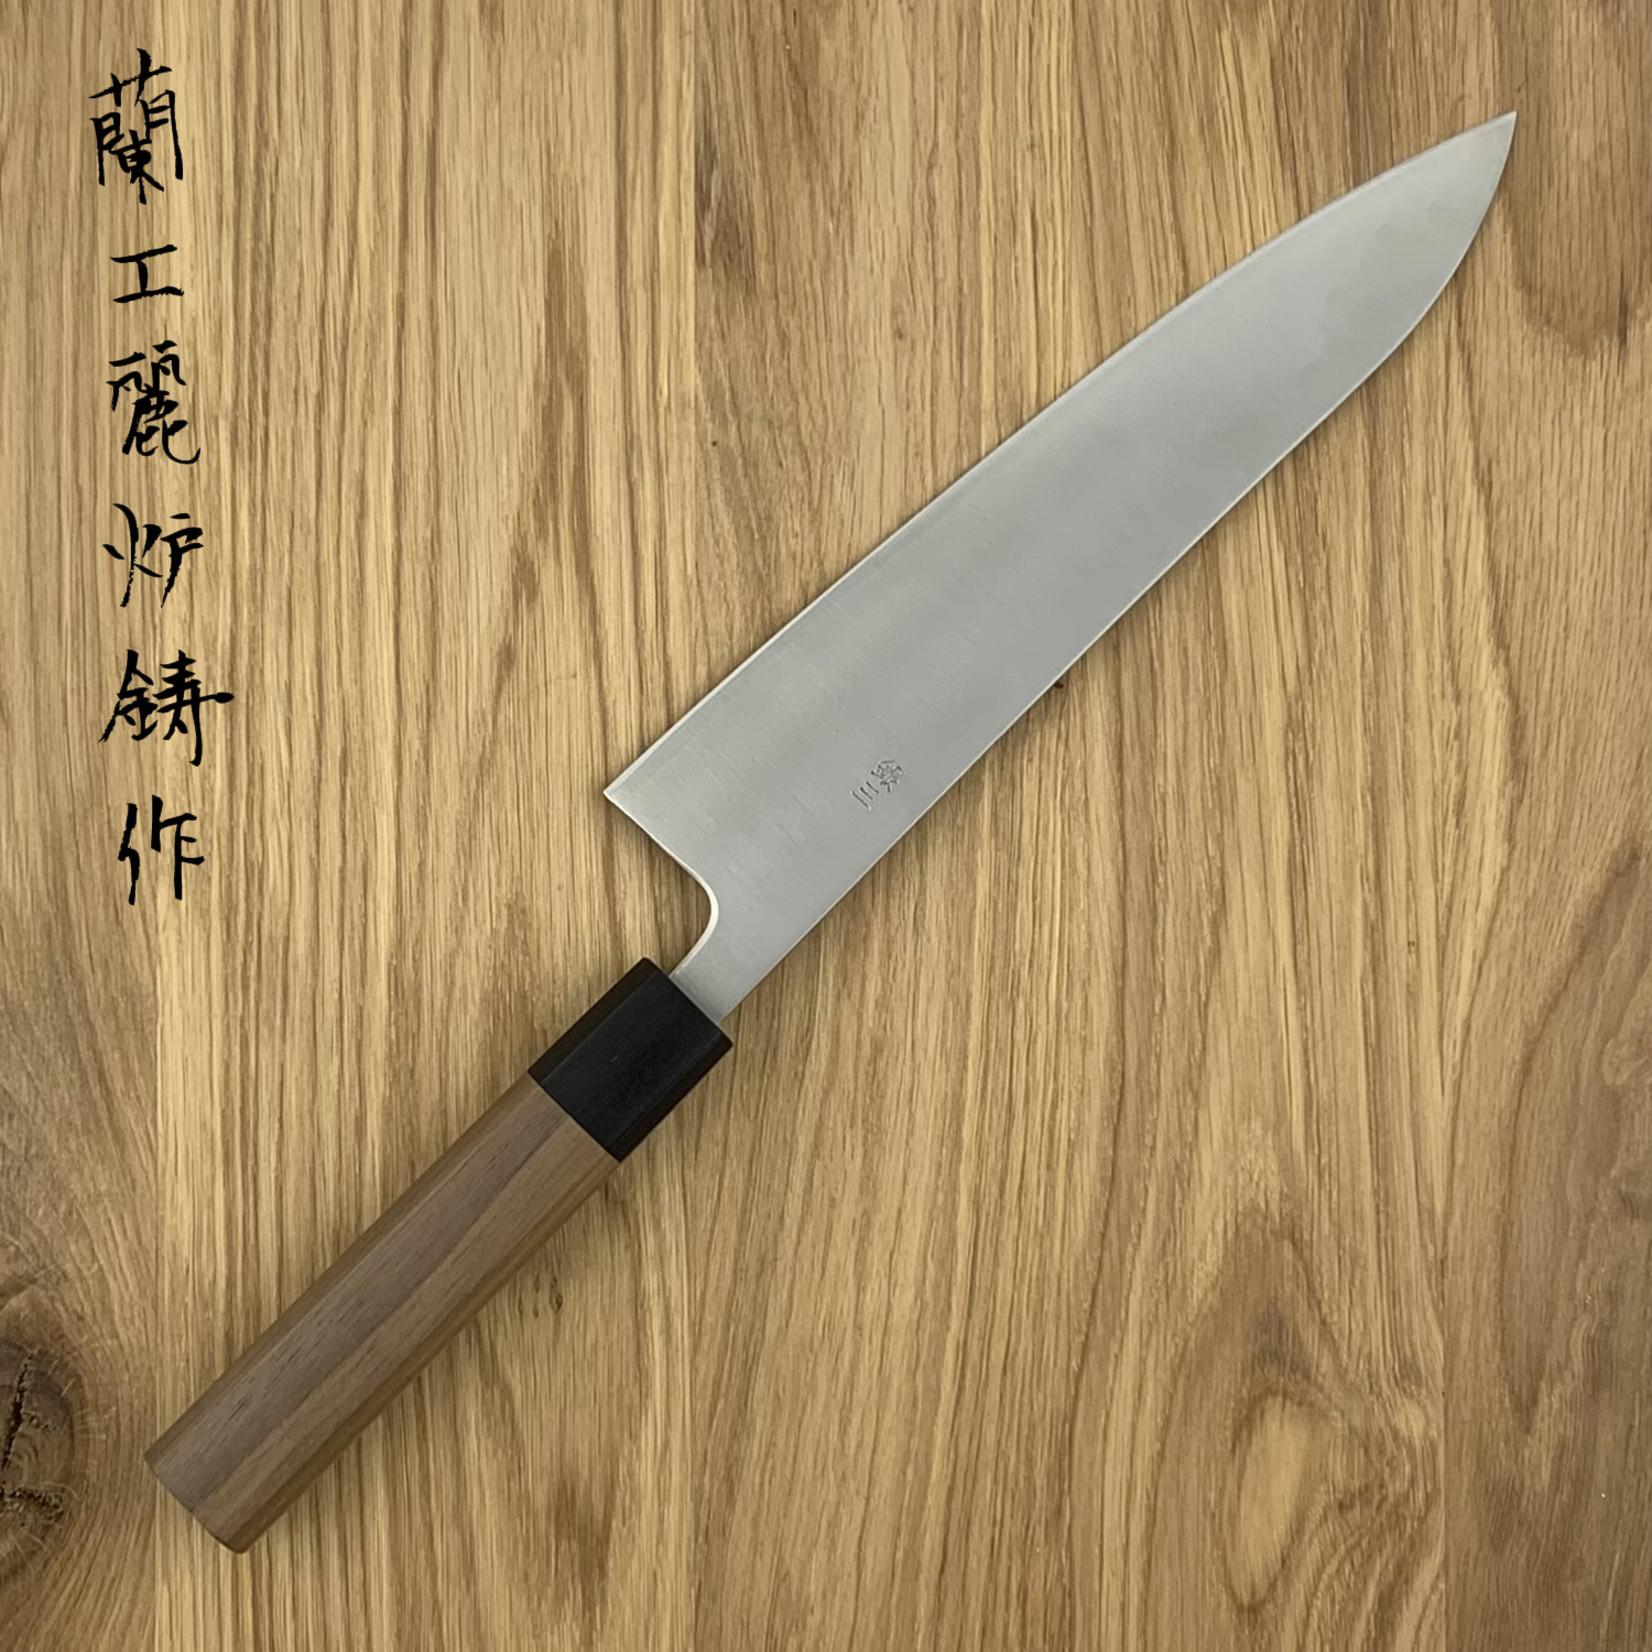 KIKUICHI Ginsan Sanmai Walnut Handle Gyuto 240mm